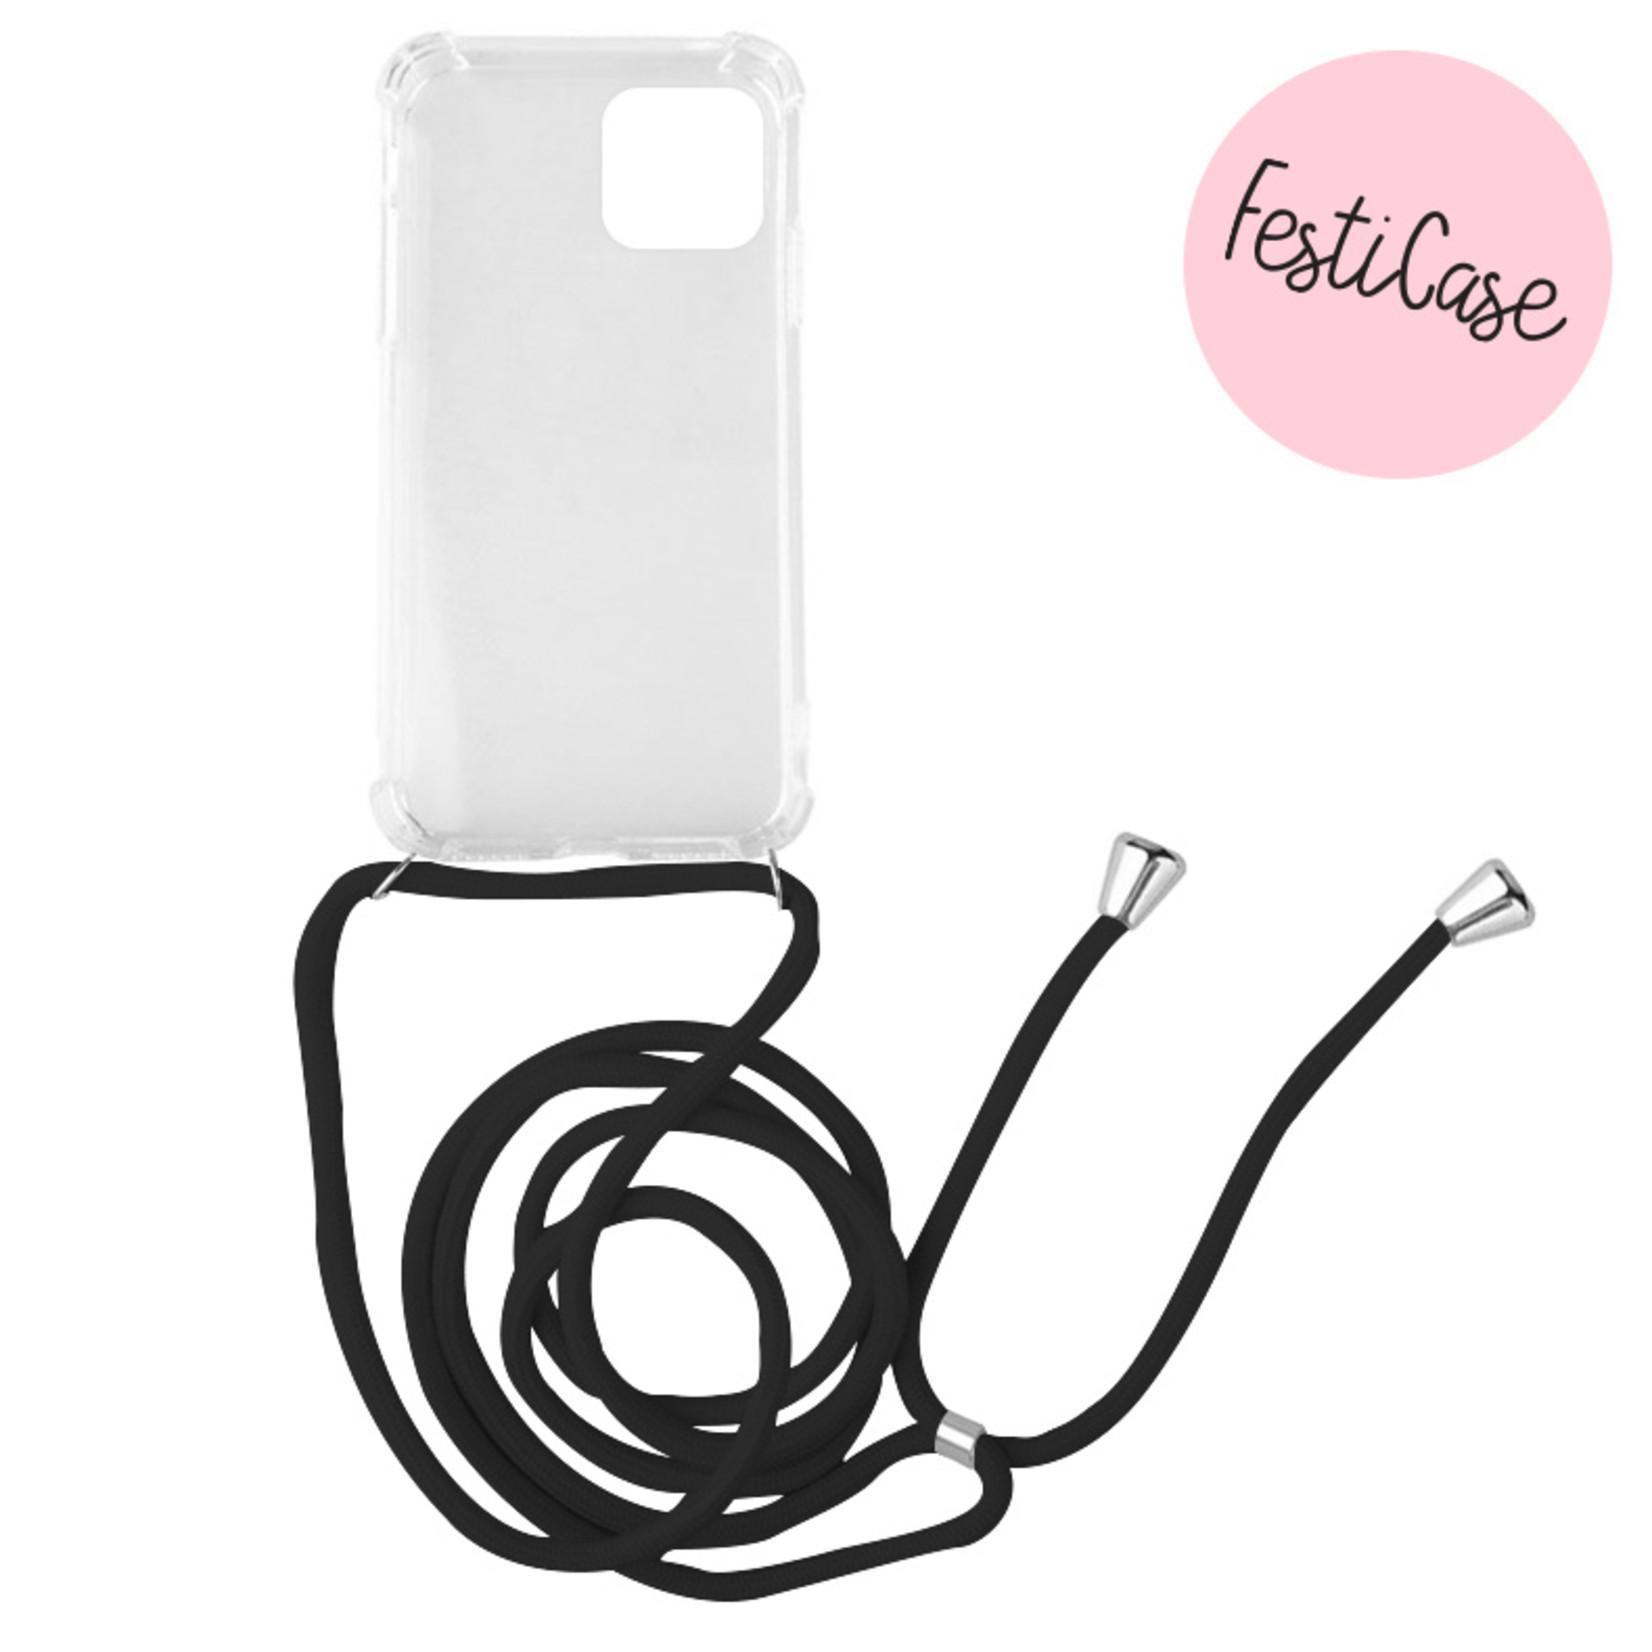 FOONCASE IPhone 11 Pro Max - Festicase Black (Phone case with cord)